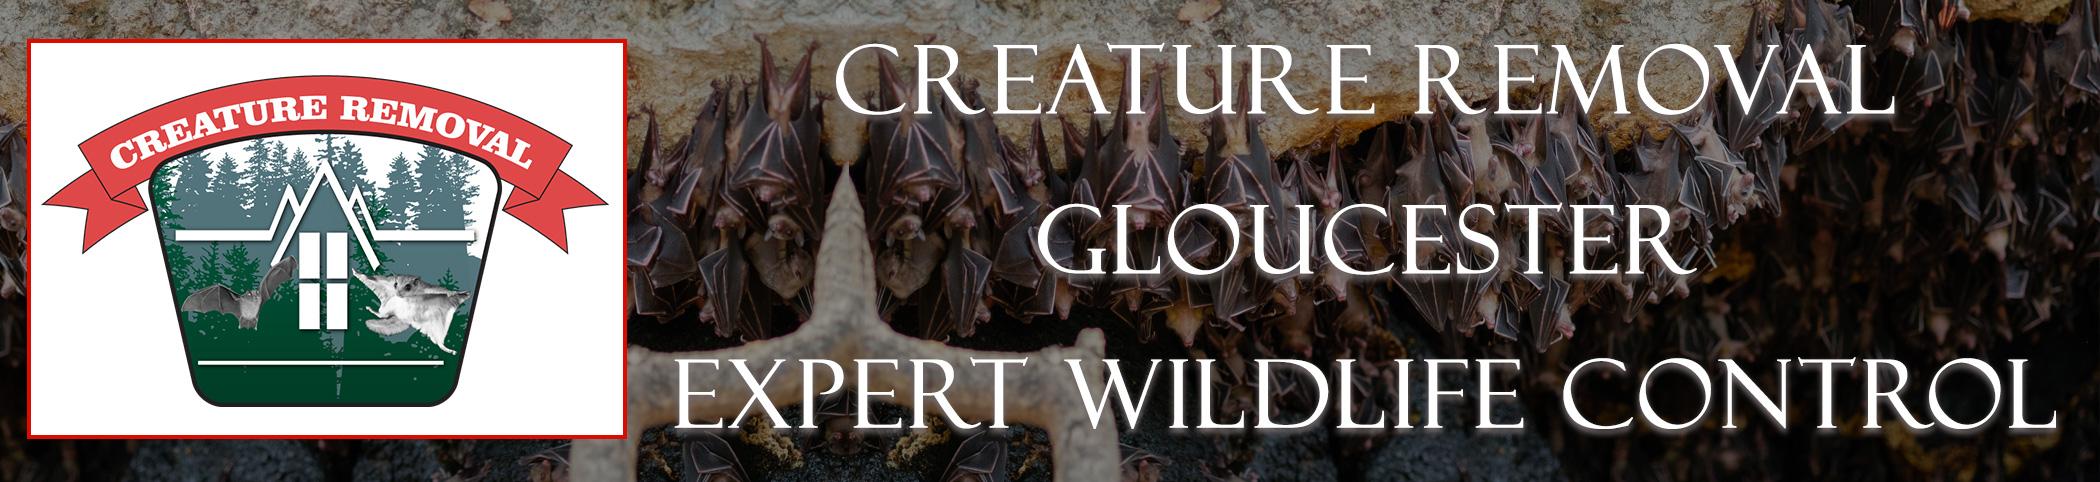 gloucester-mass-creature-removal-header